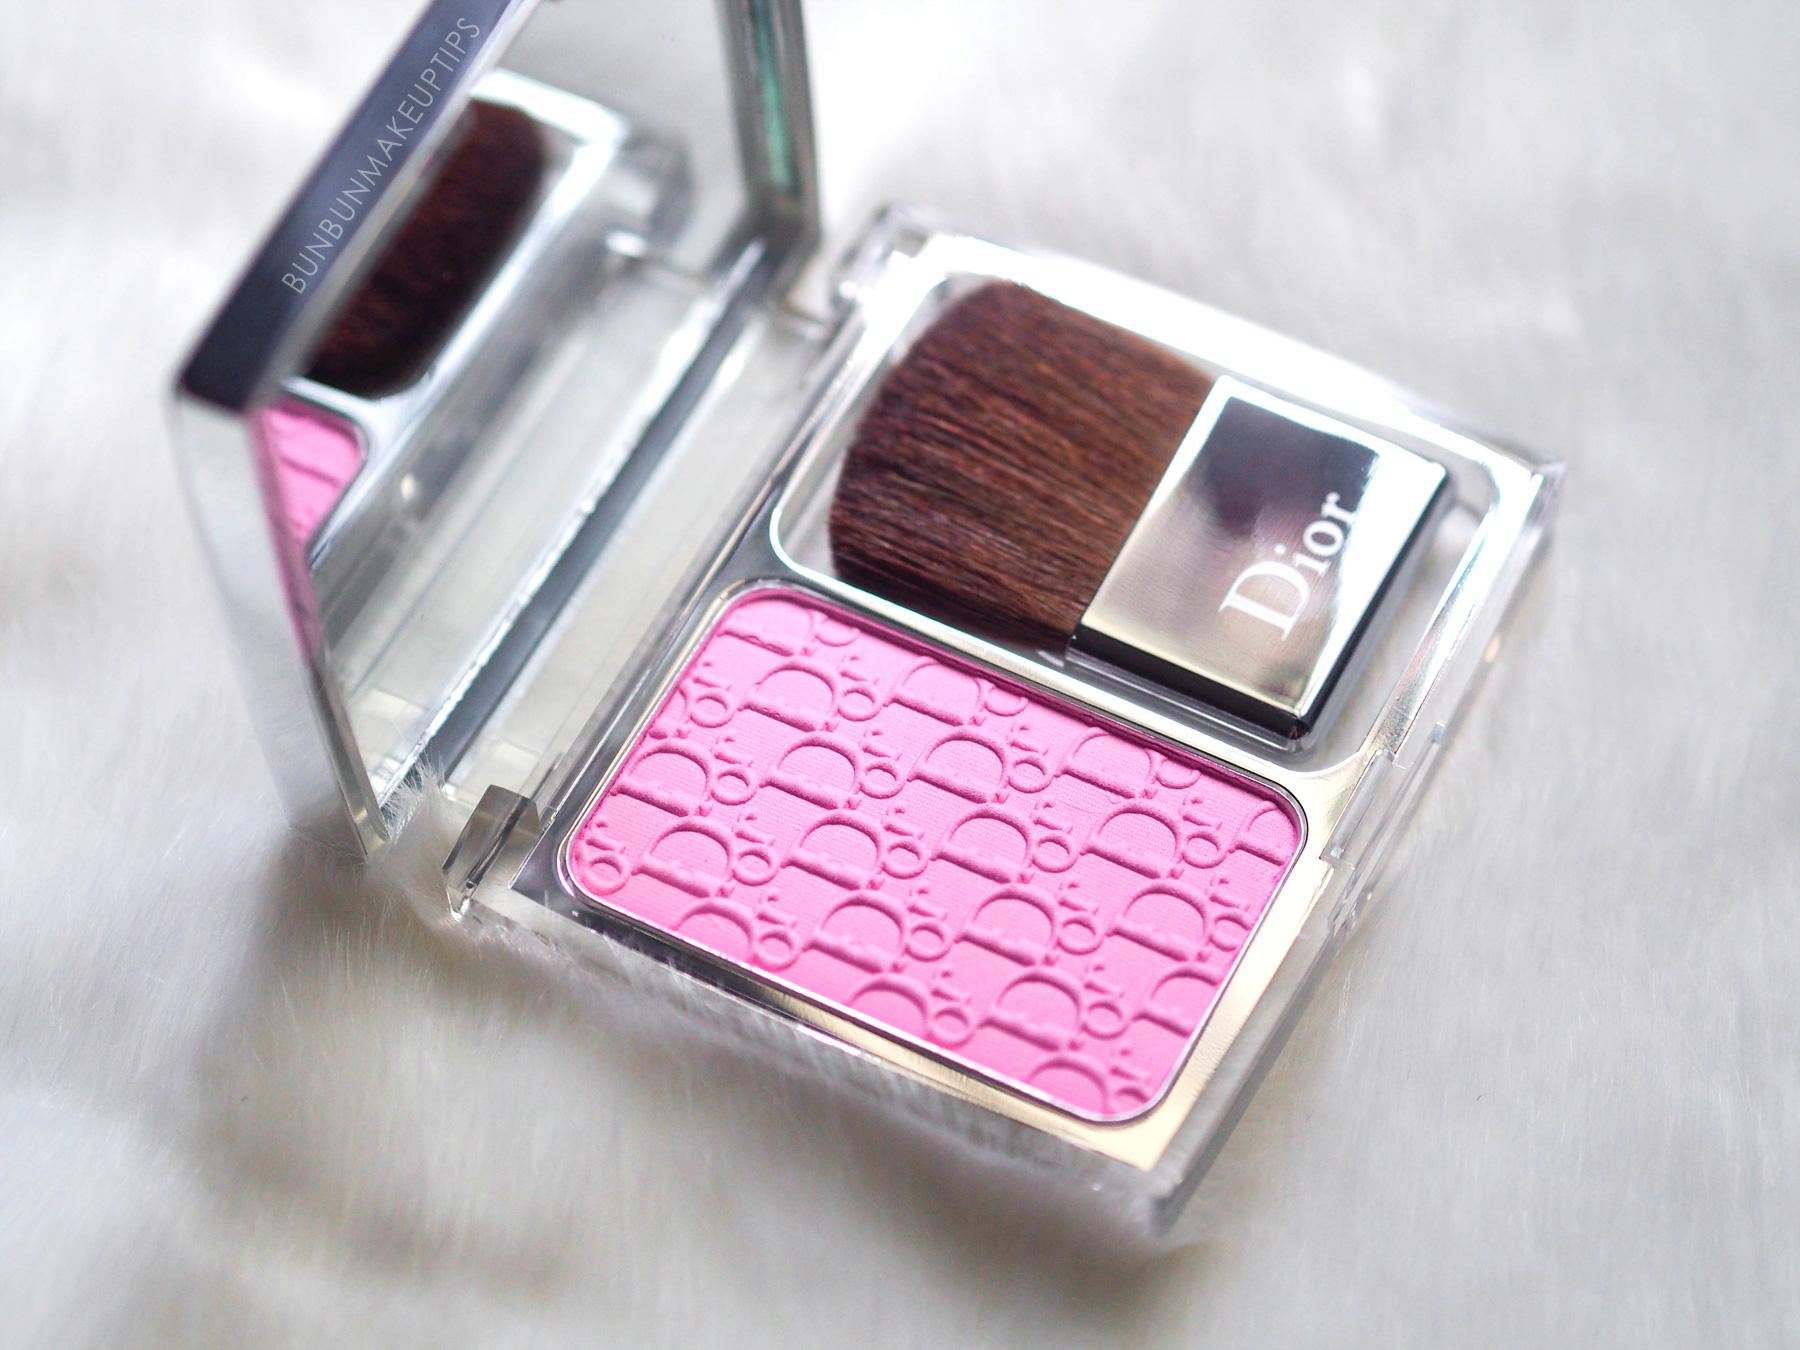 Dior-Rosy-Glow-Healthy-Glow-Awakening-Blush-Review_3